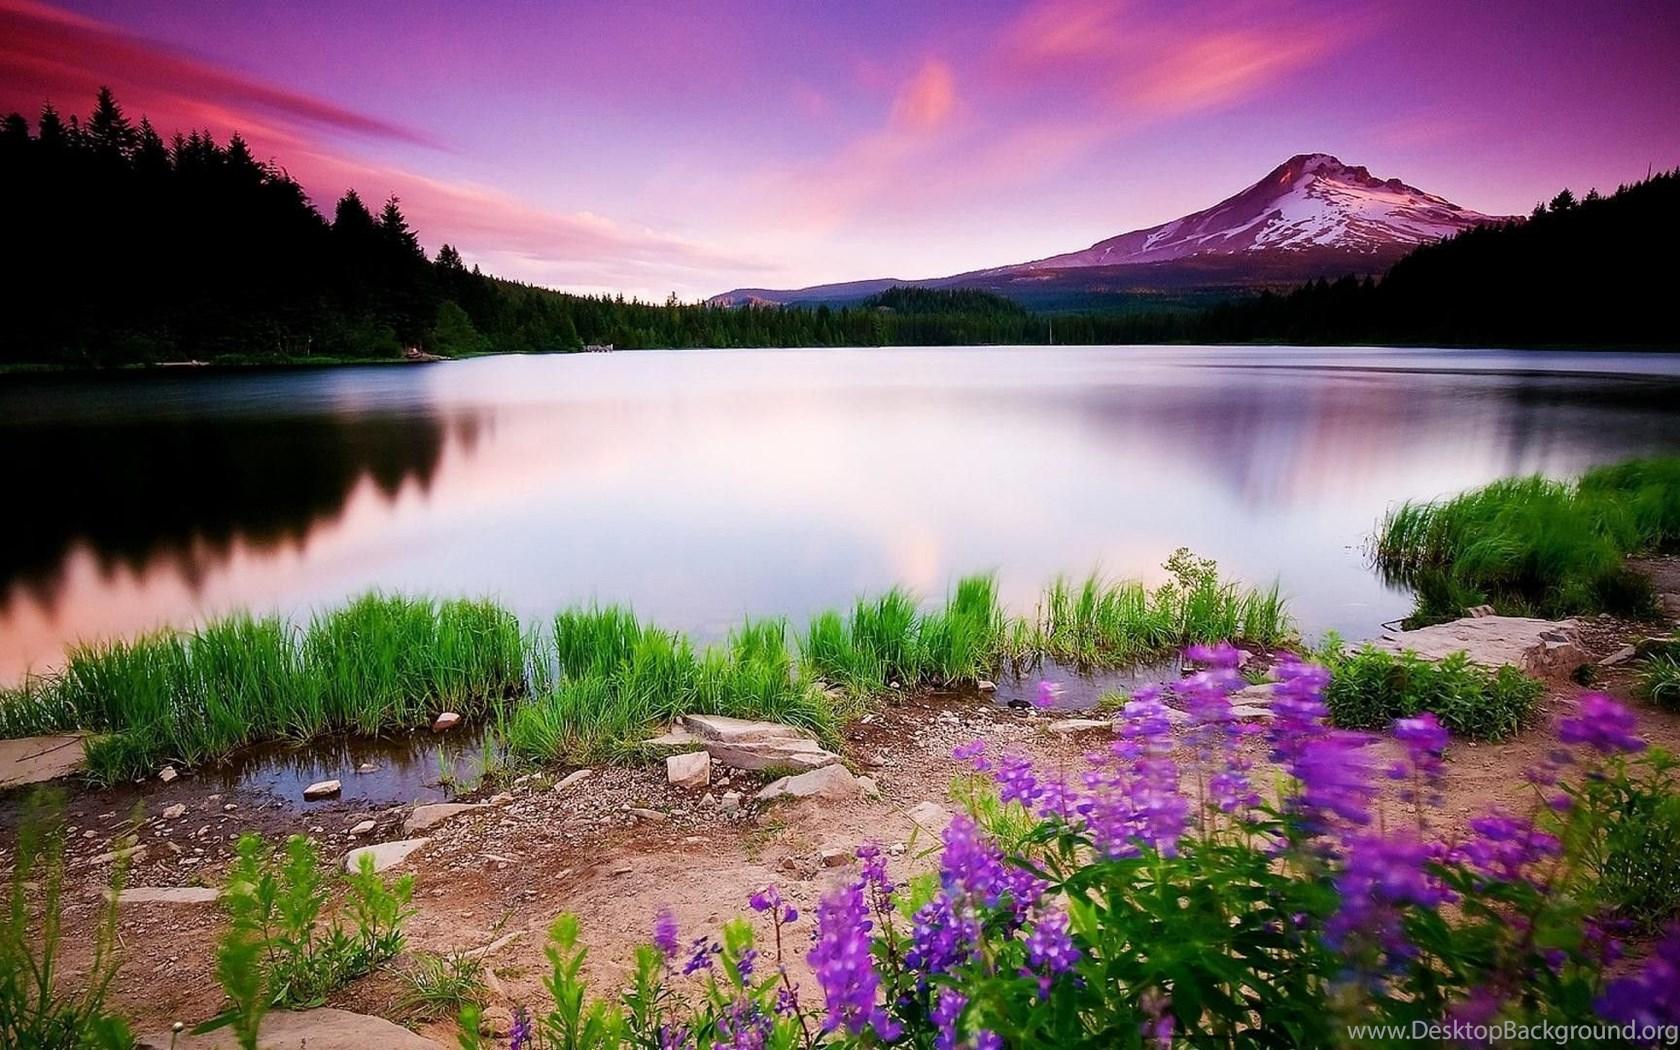 3d wallpaper hd 1080p free download,natural landscape,nature,sky,lake,wilderness